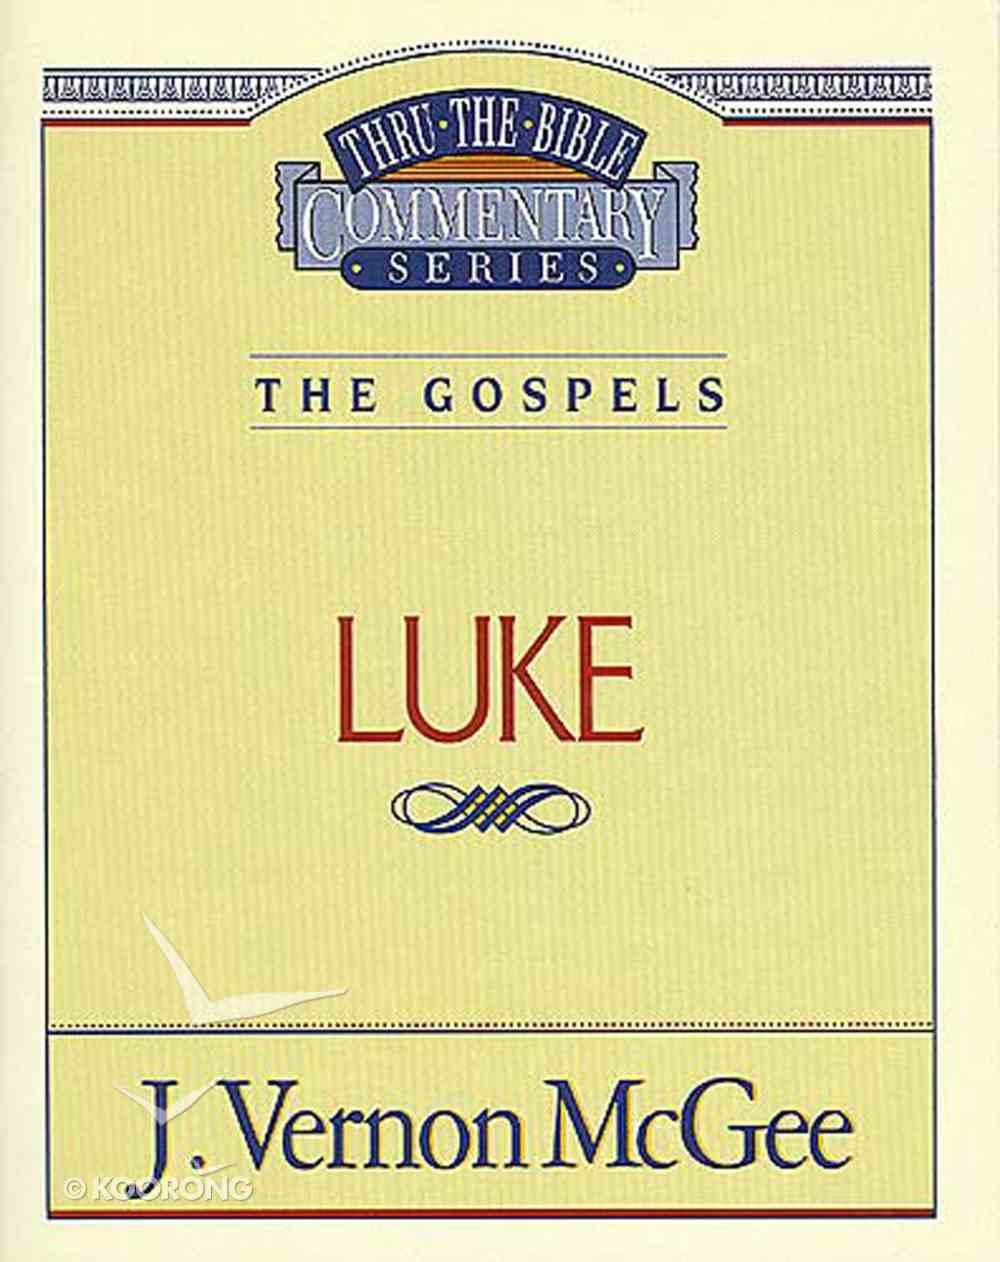 Thru the Bible NT #37: Luke (#37 in Thru The Bible New Testament Series) eBook